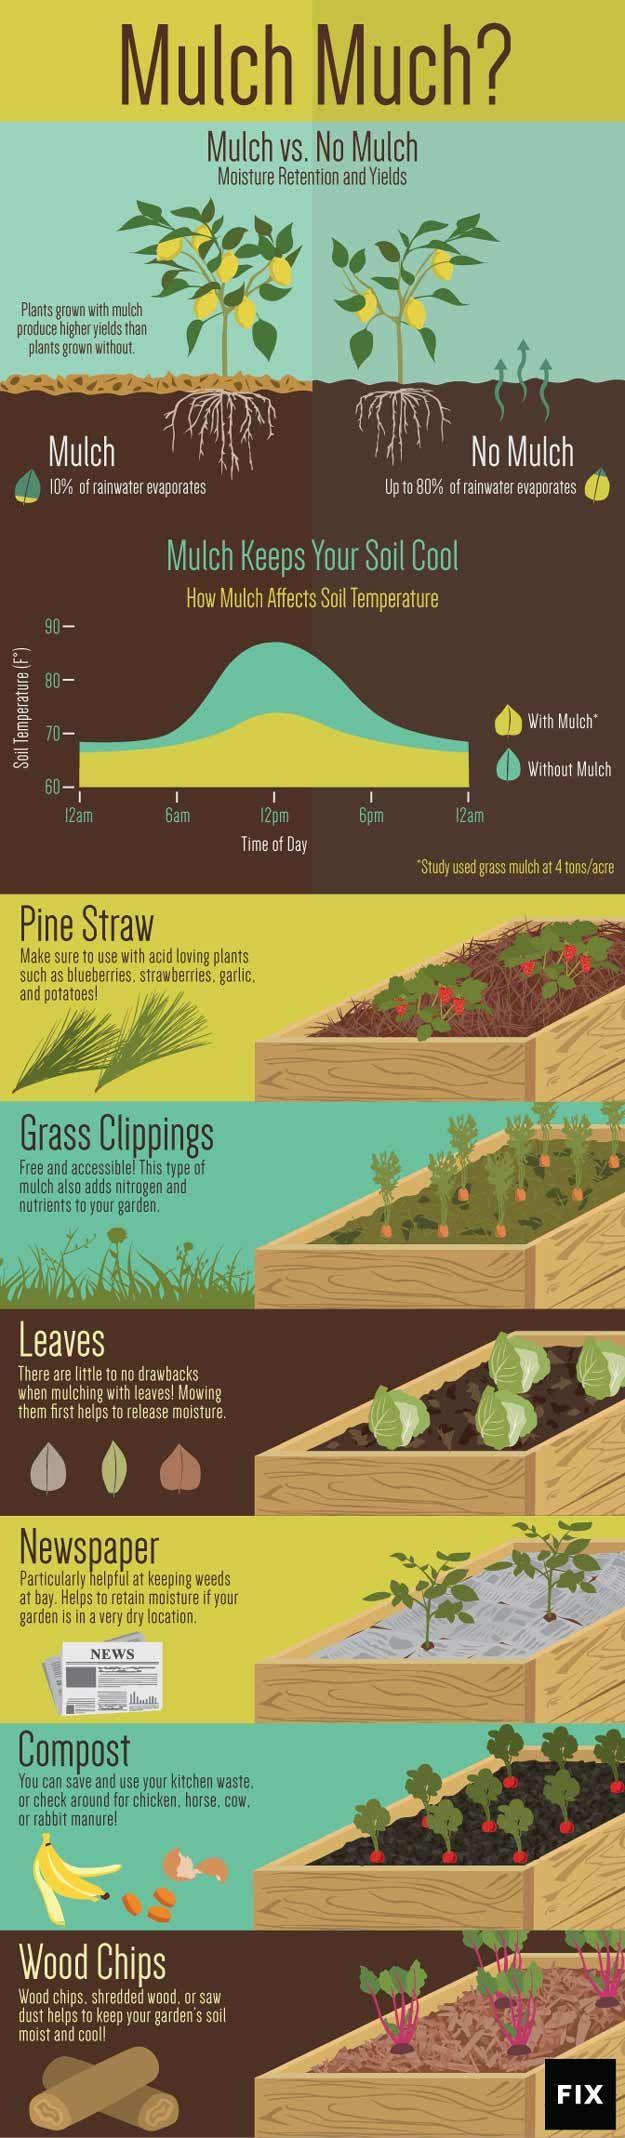 The Benefits Of Garden Mulch | Gardening & Homesteading Tips by Pioneer Settler at http://pioneersettler.com/garden-mulch/